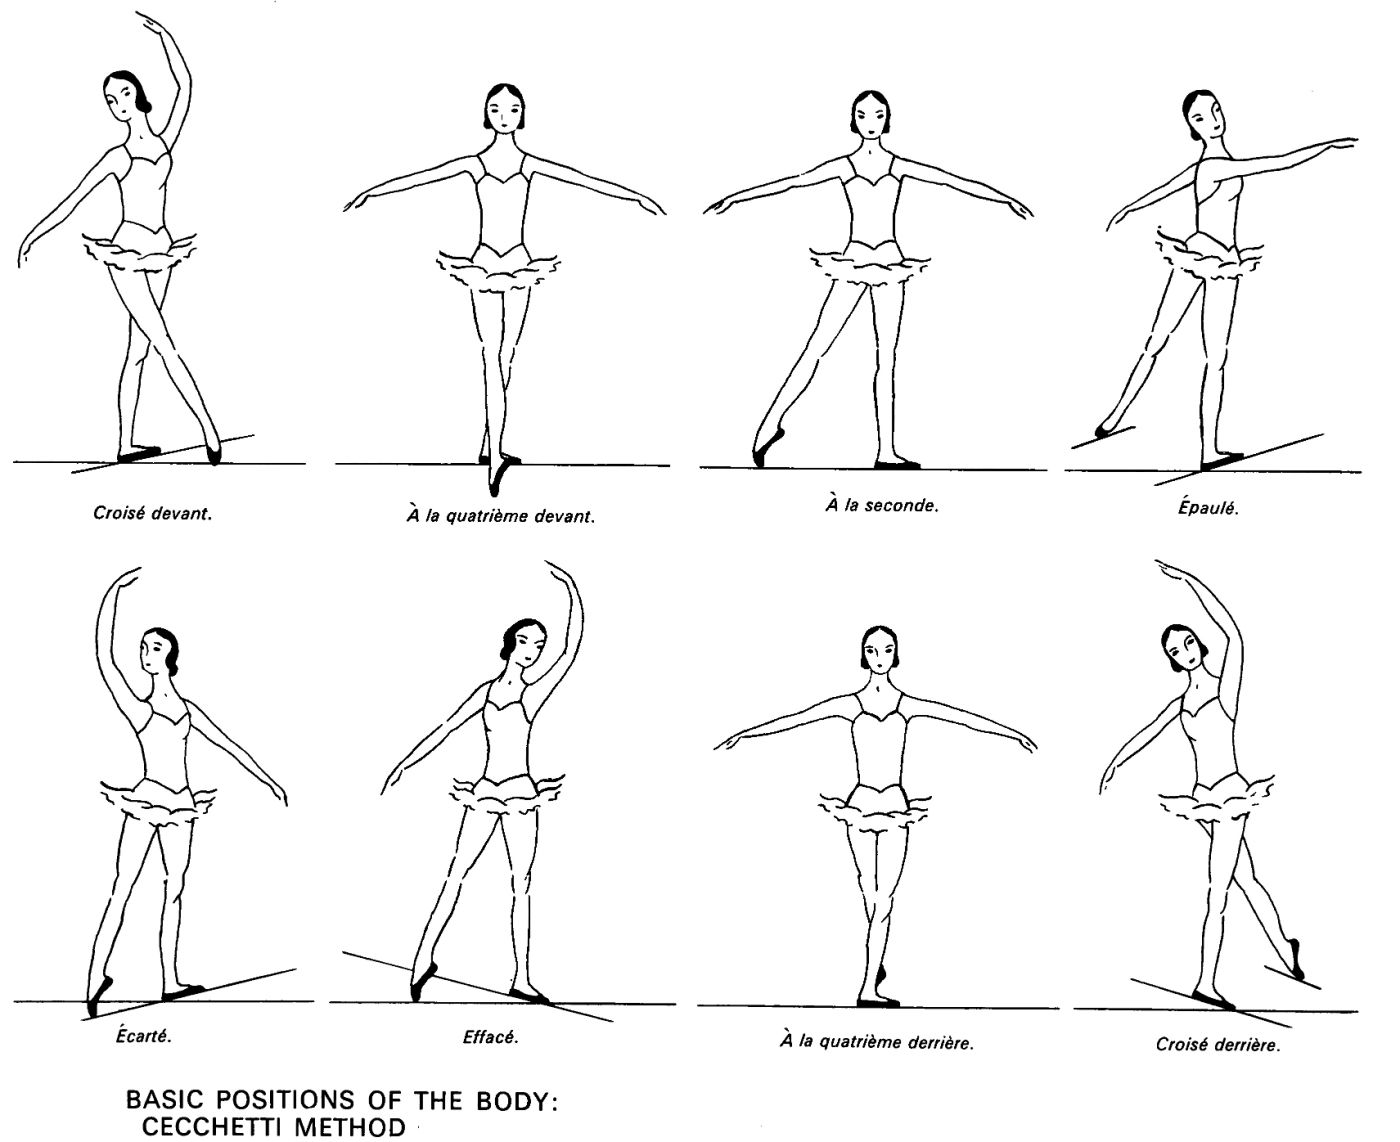 Basic Positions Of The Body Cecchetti Method